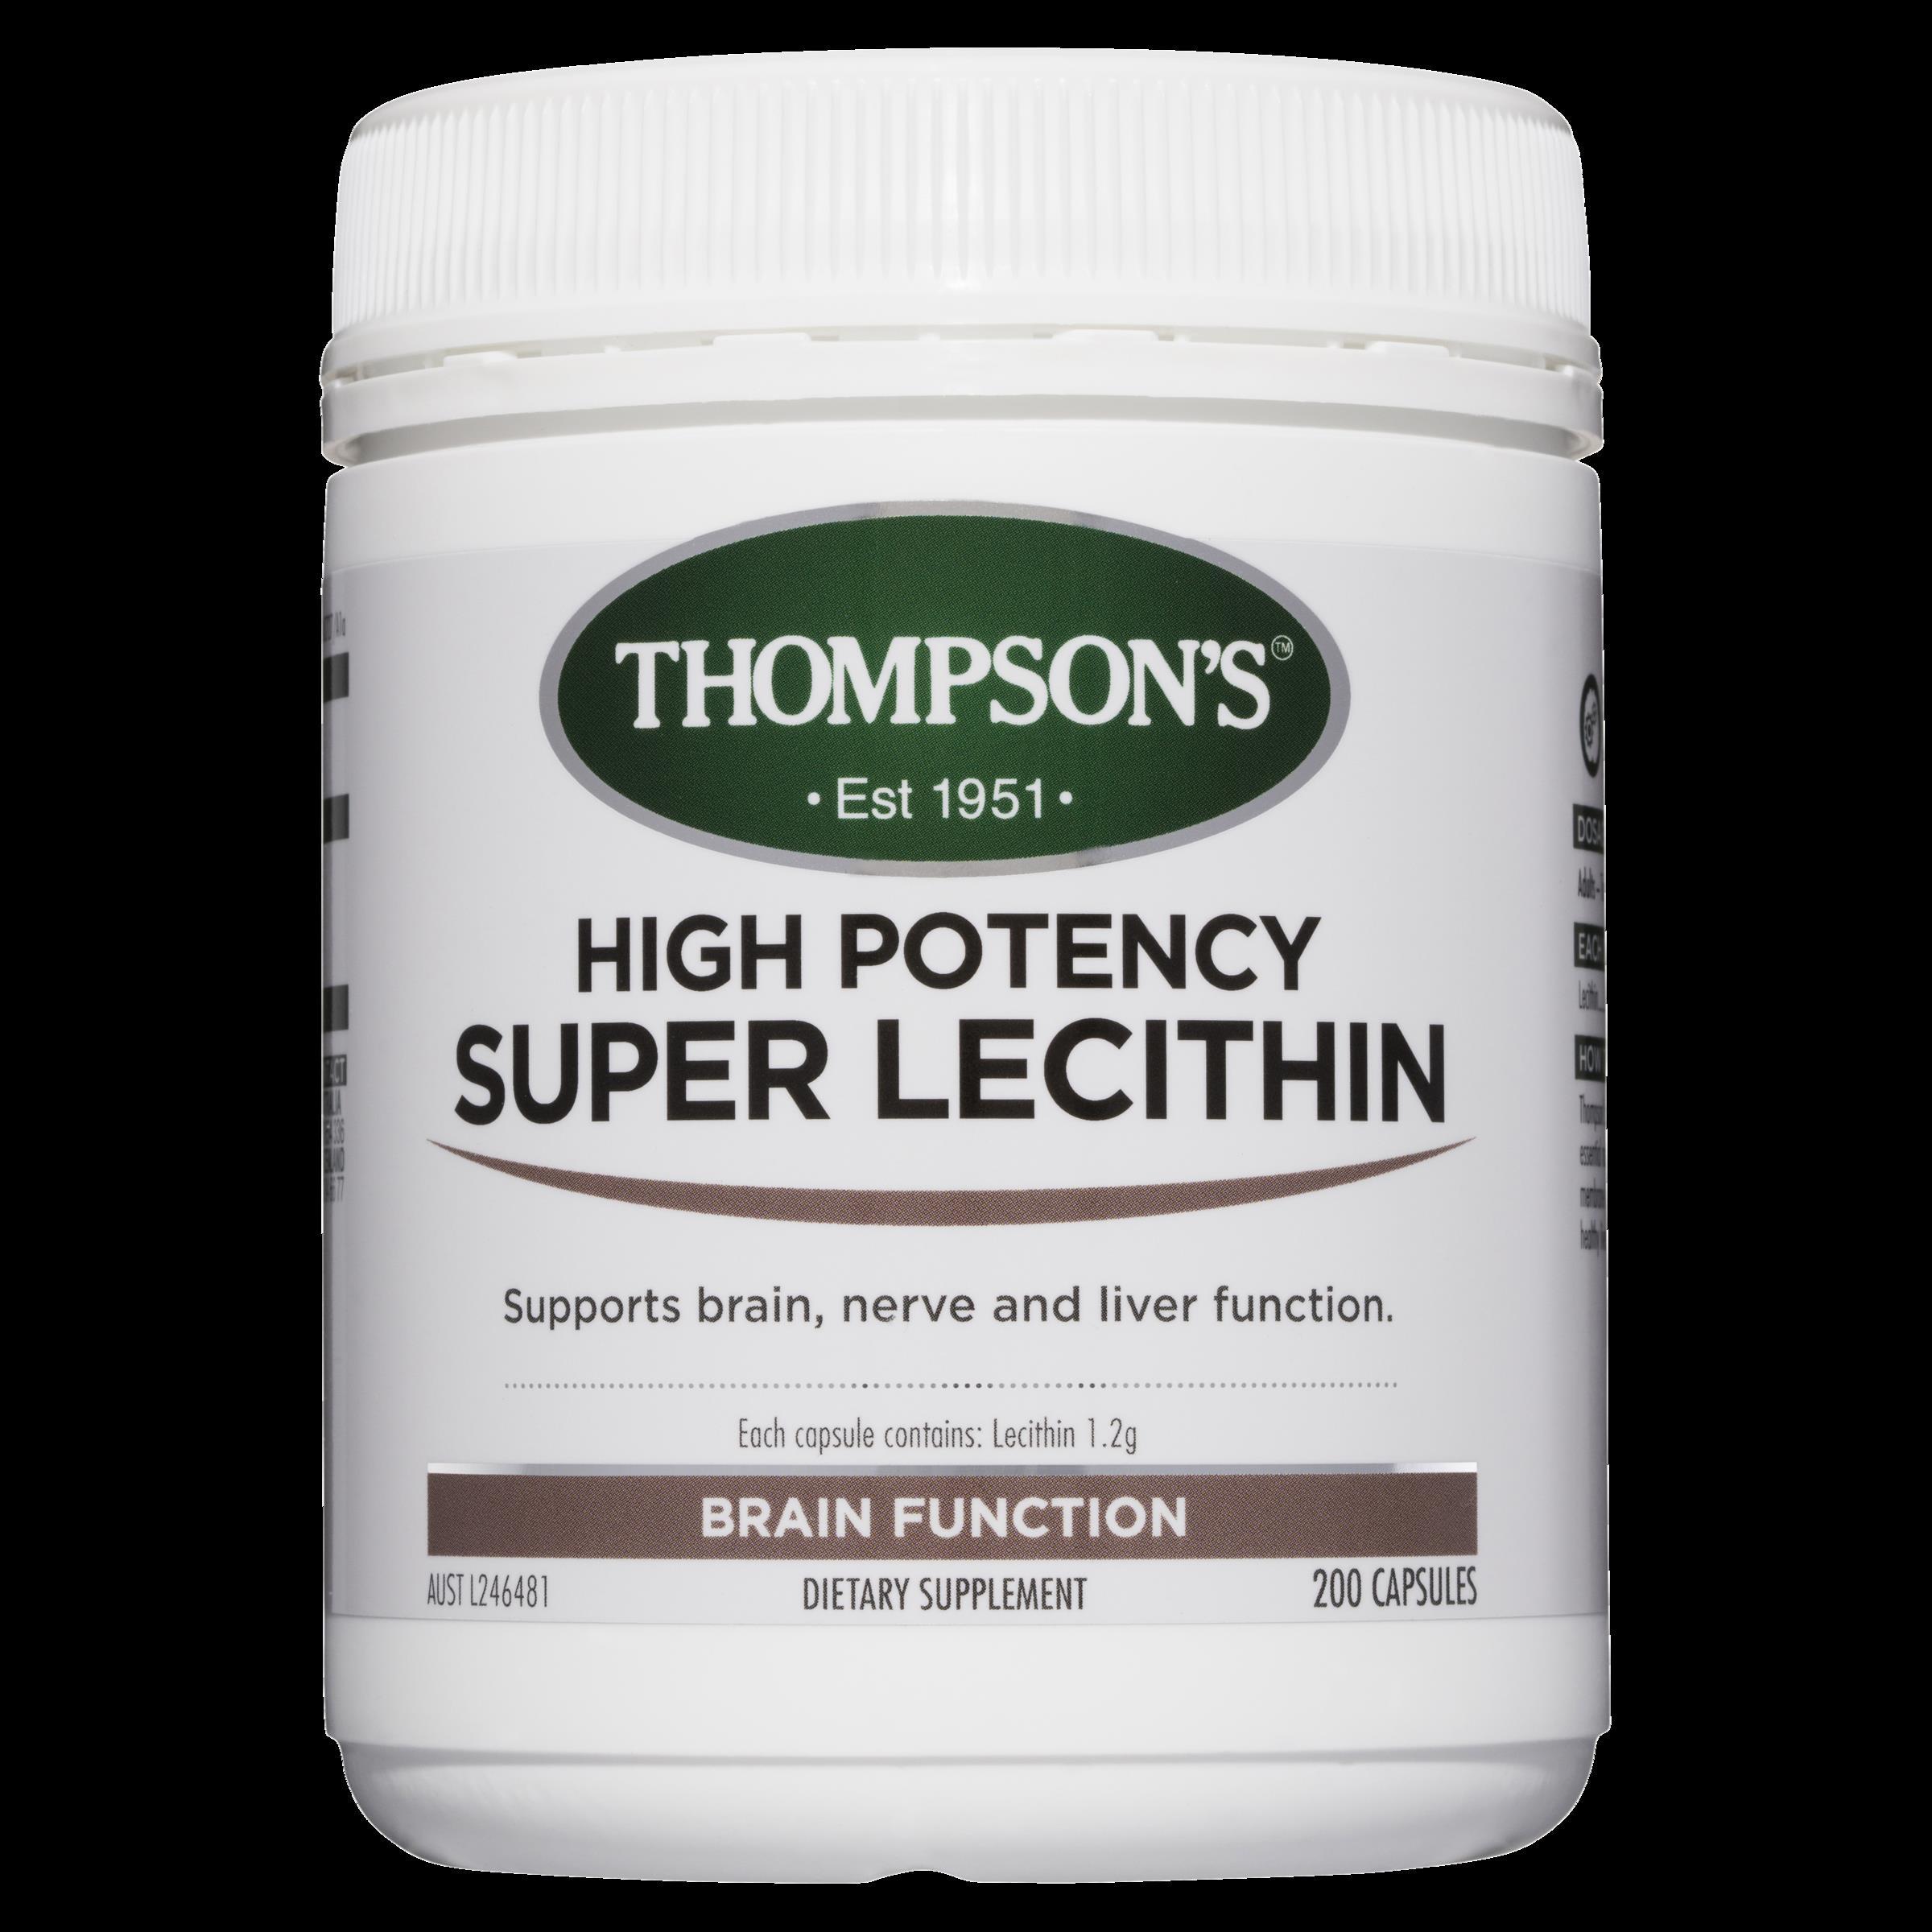 thompson-high-potency-super-lecithin-200caps